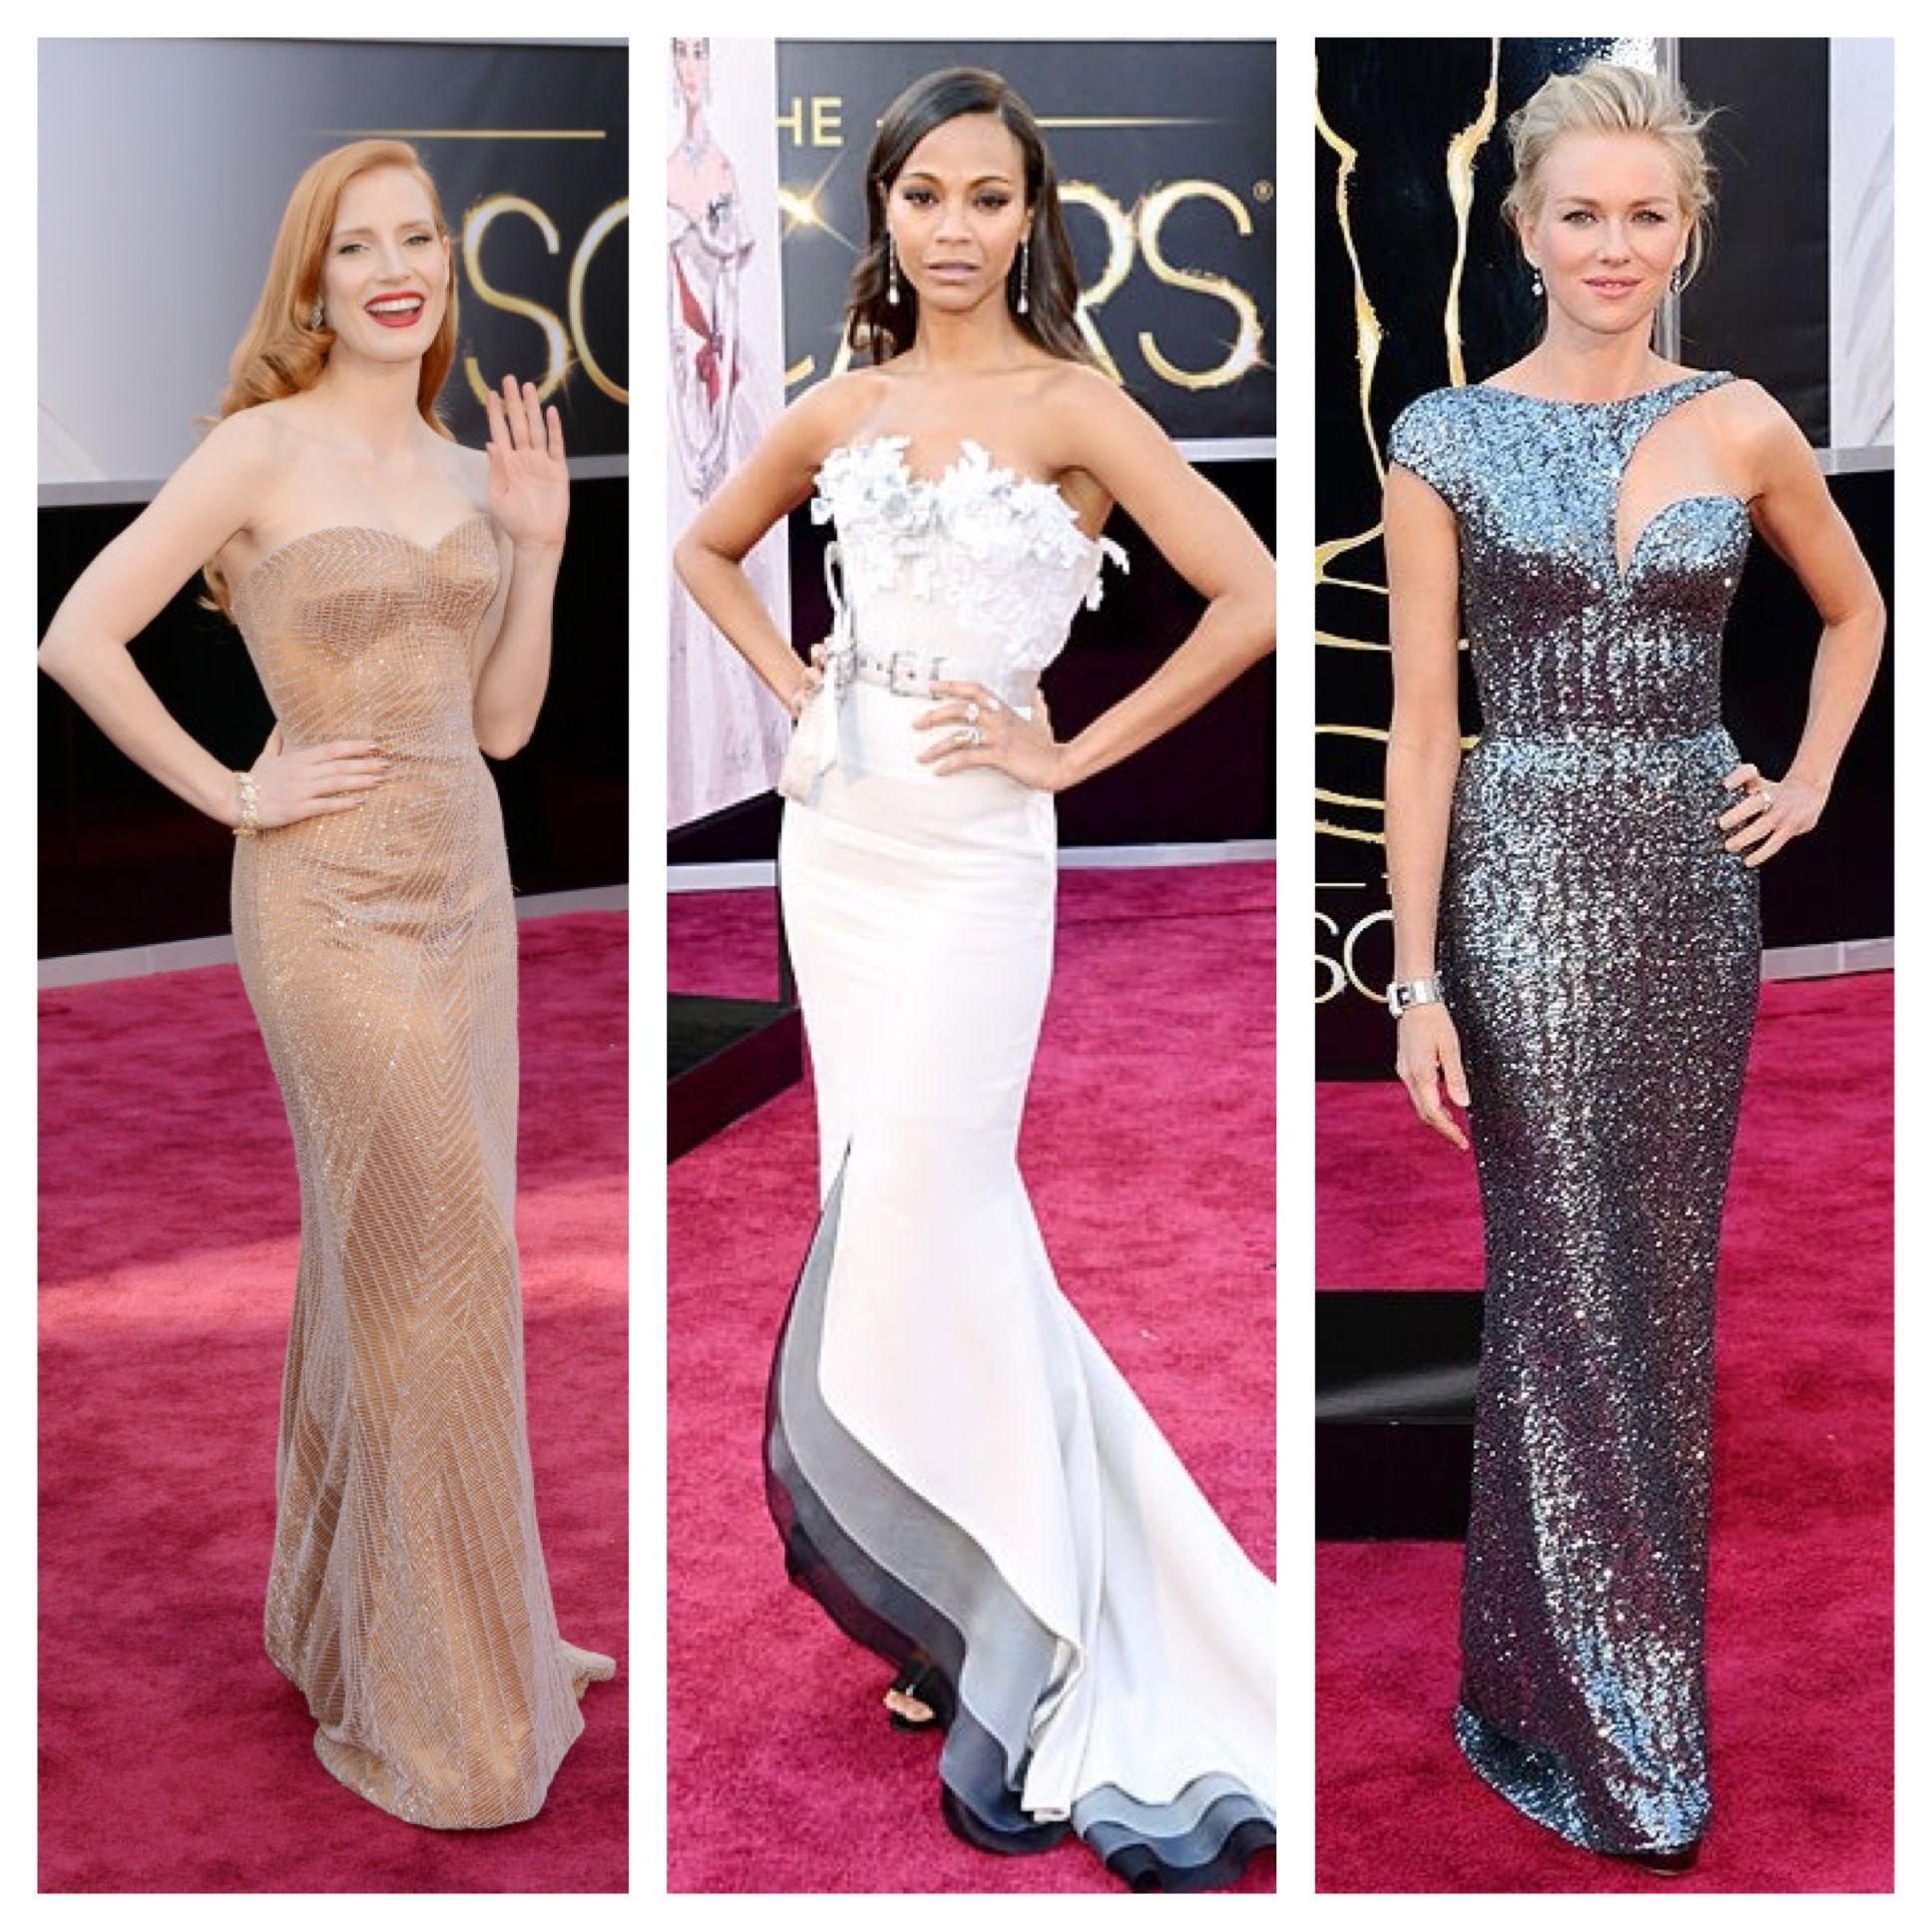 My favorite #Eredcarpet looks: Jessica Chastain, Zoe Saldana, and ...